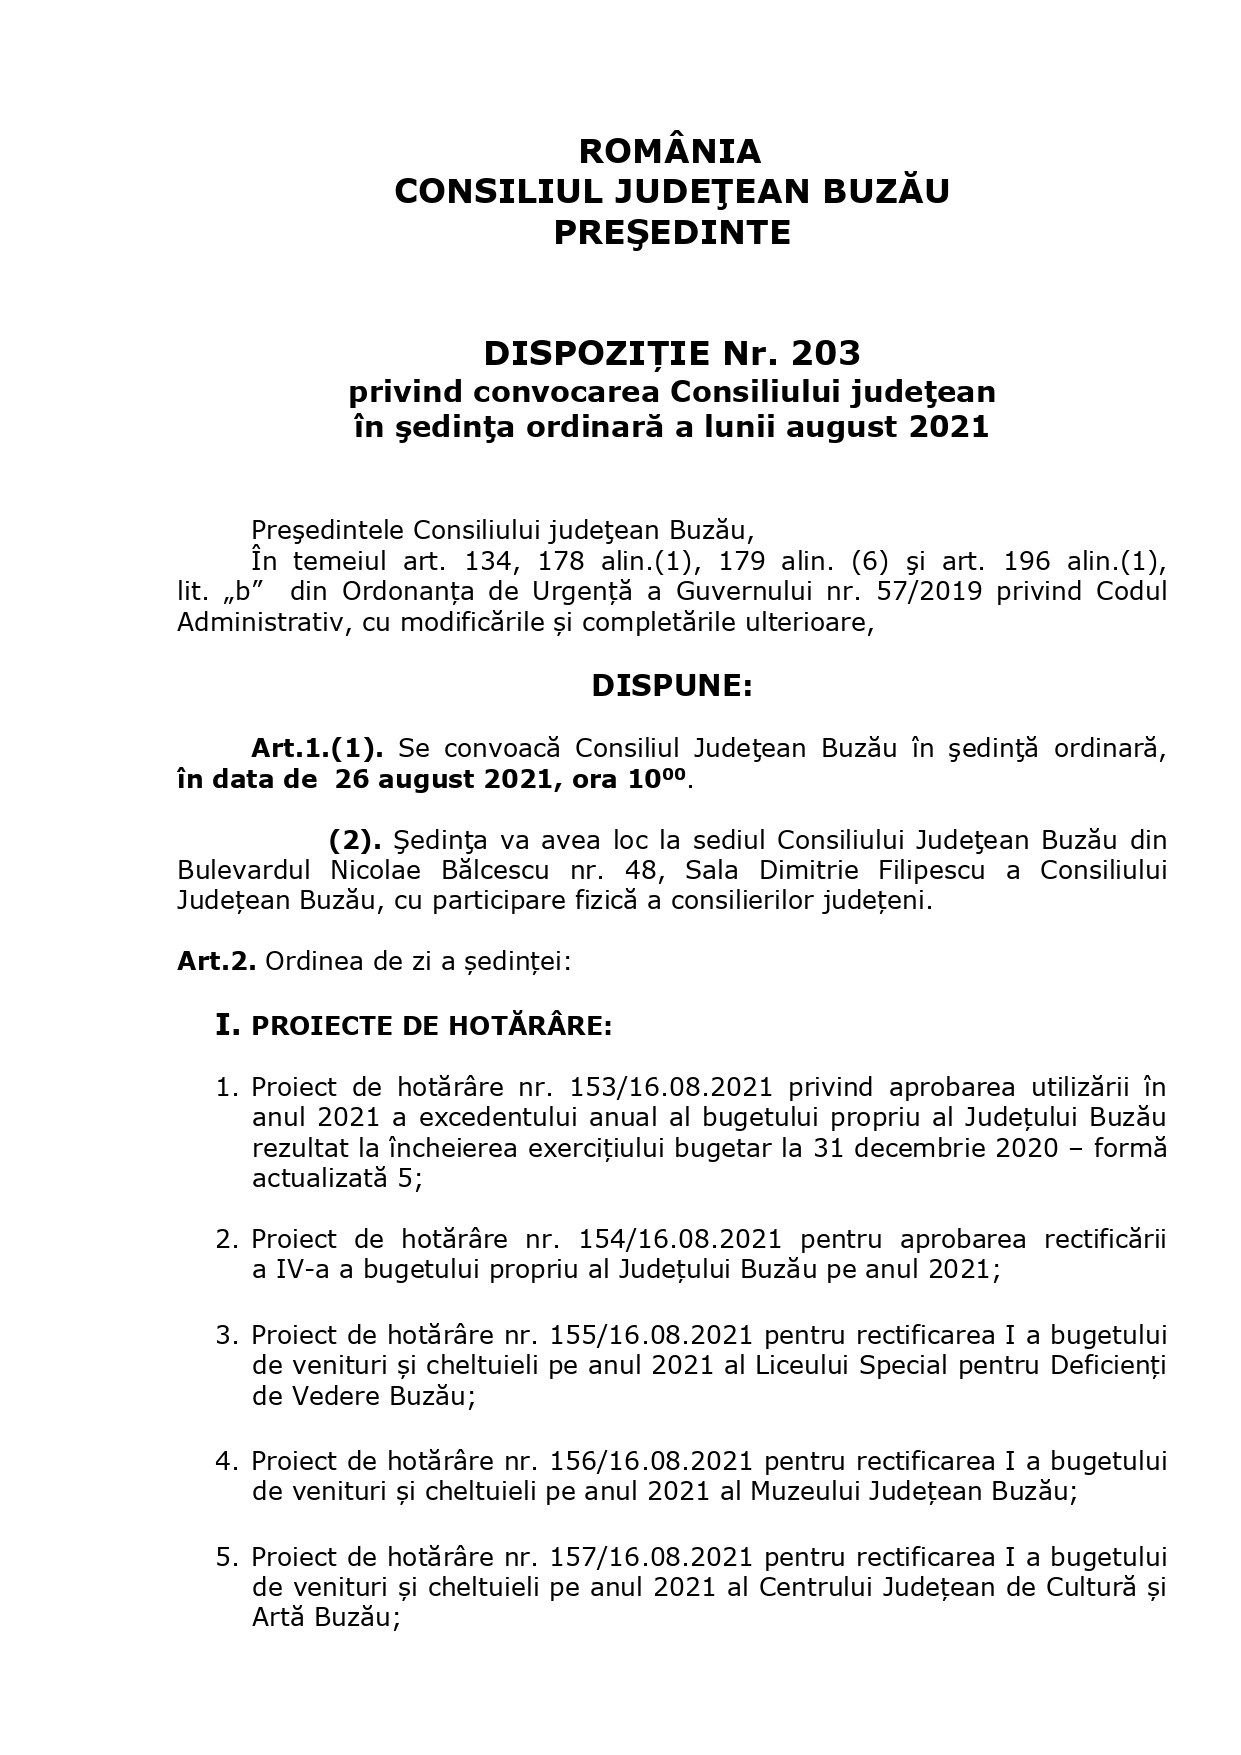 Disp. conv. 26 aug. 2021 page 0001